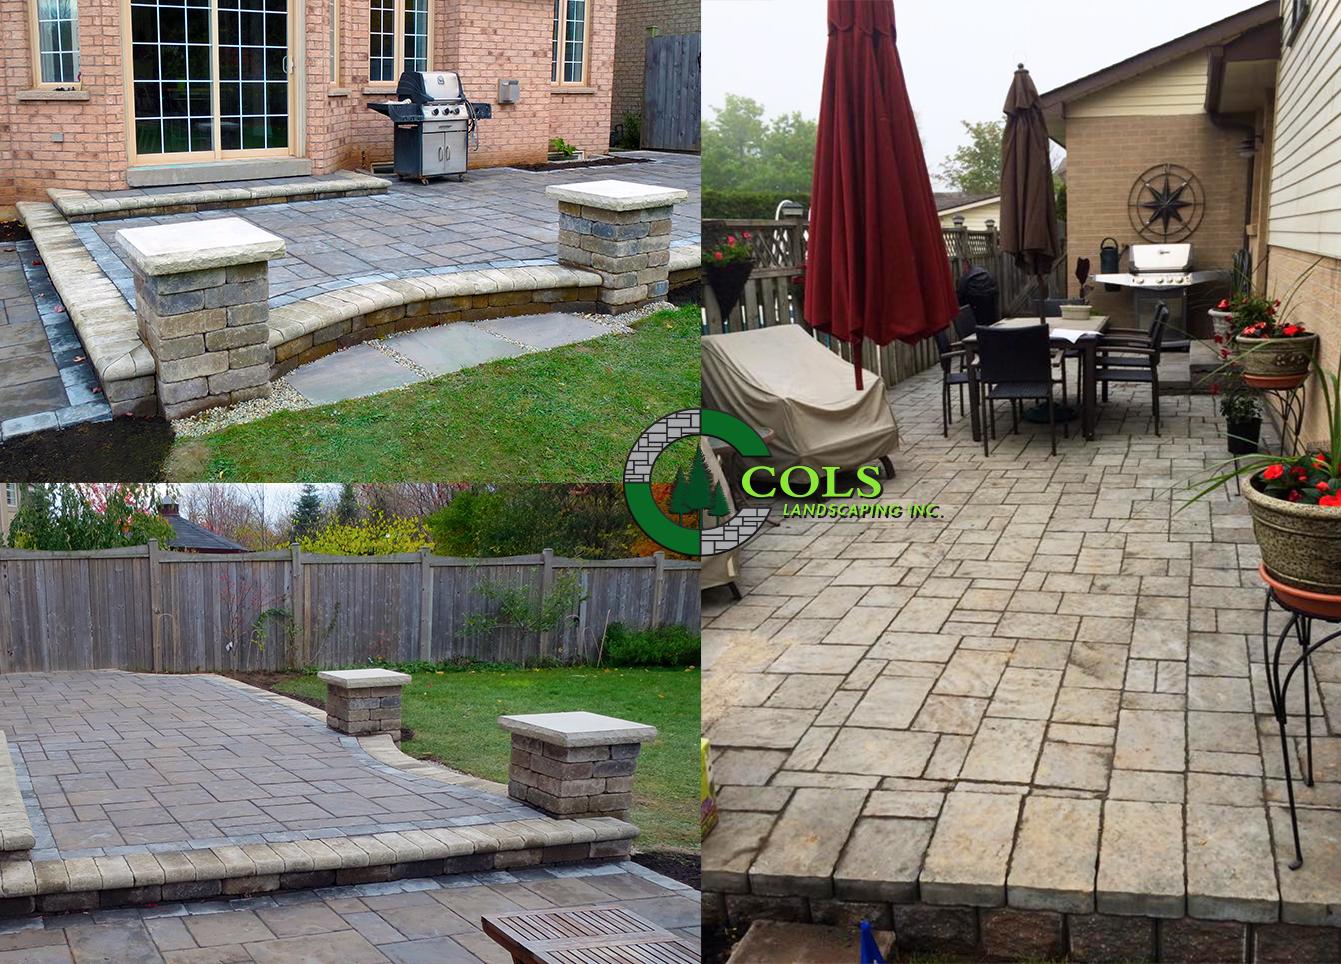 COLS backyard patio stone designs